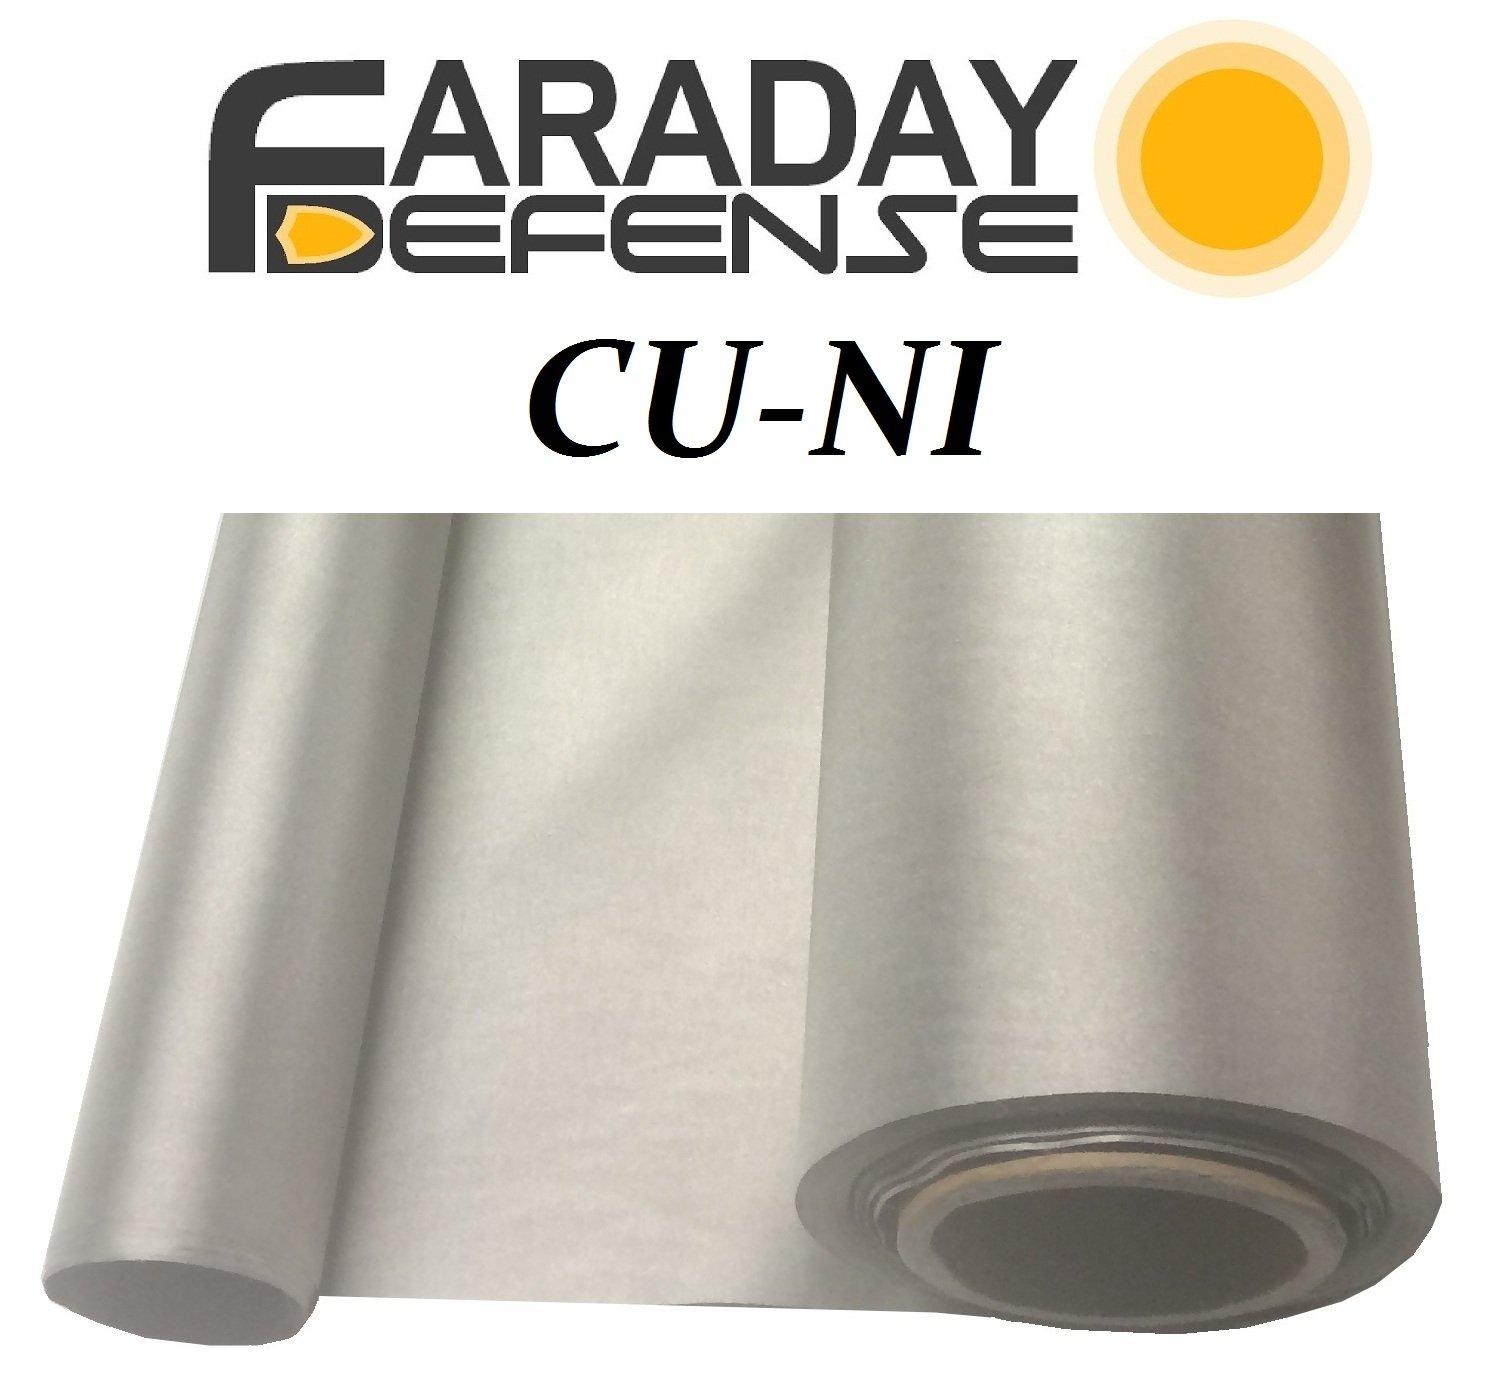 Faraday Defense RF RFID EMF Shielding Nickel Copper Fabric 50 x 1' Signal Blocking Material LYSB01HPFAV6K-CMPTRACCS